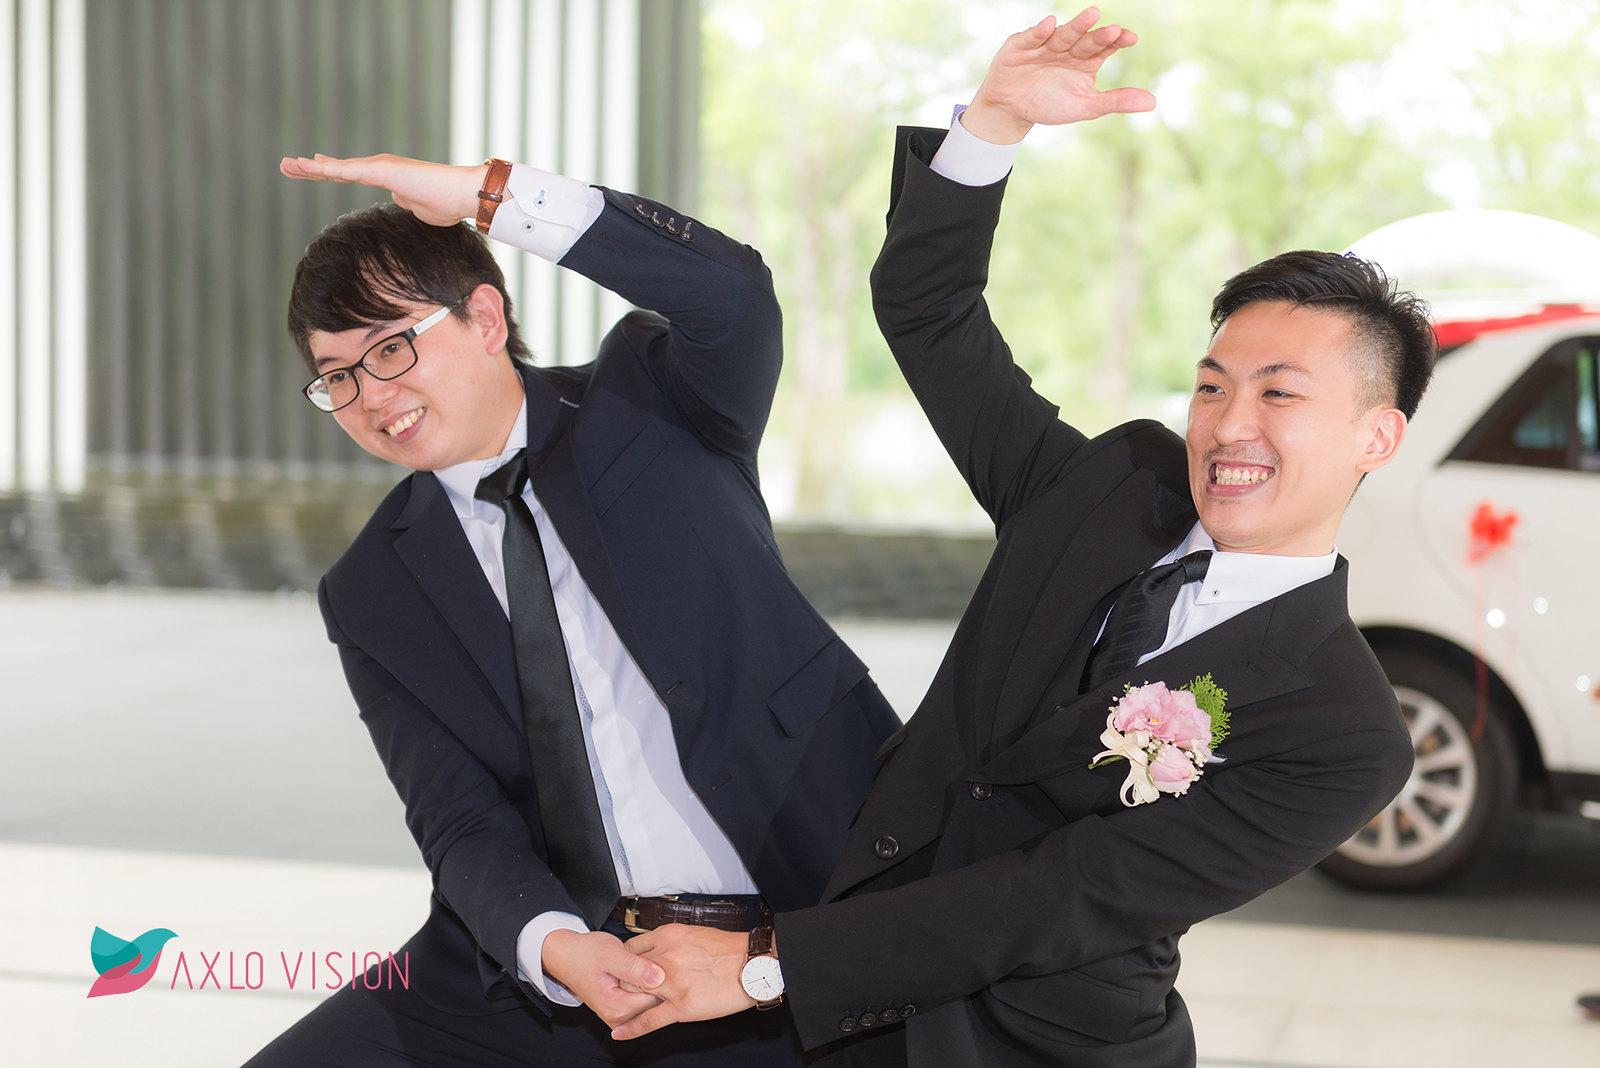 20170916 WeddingDay_065